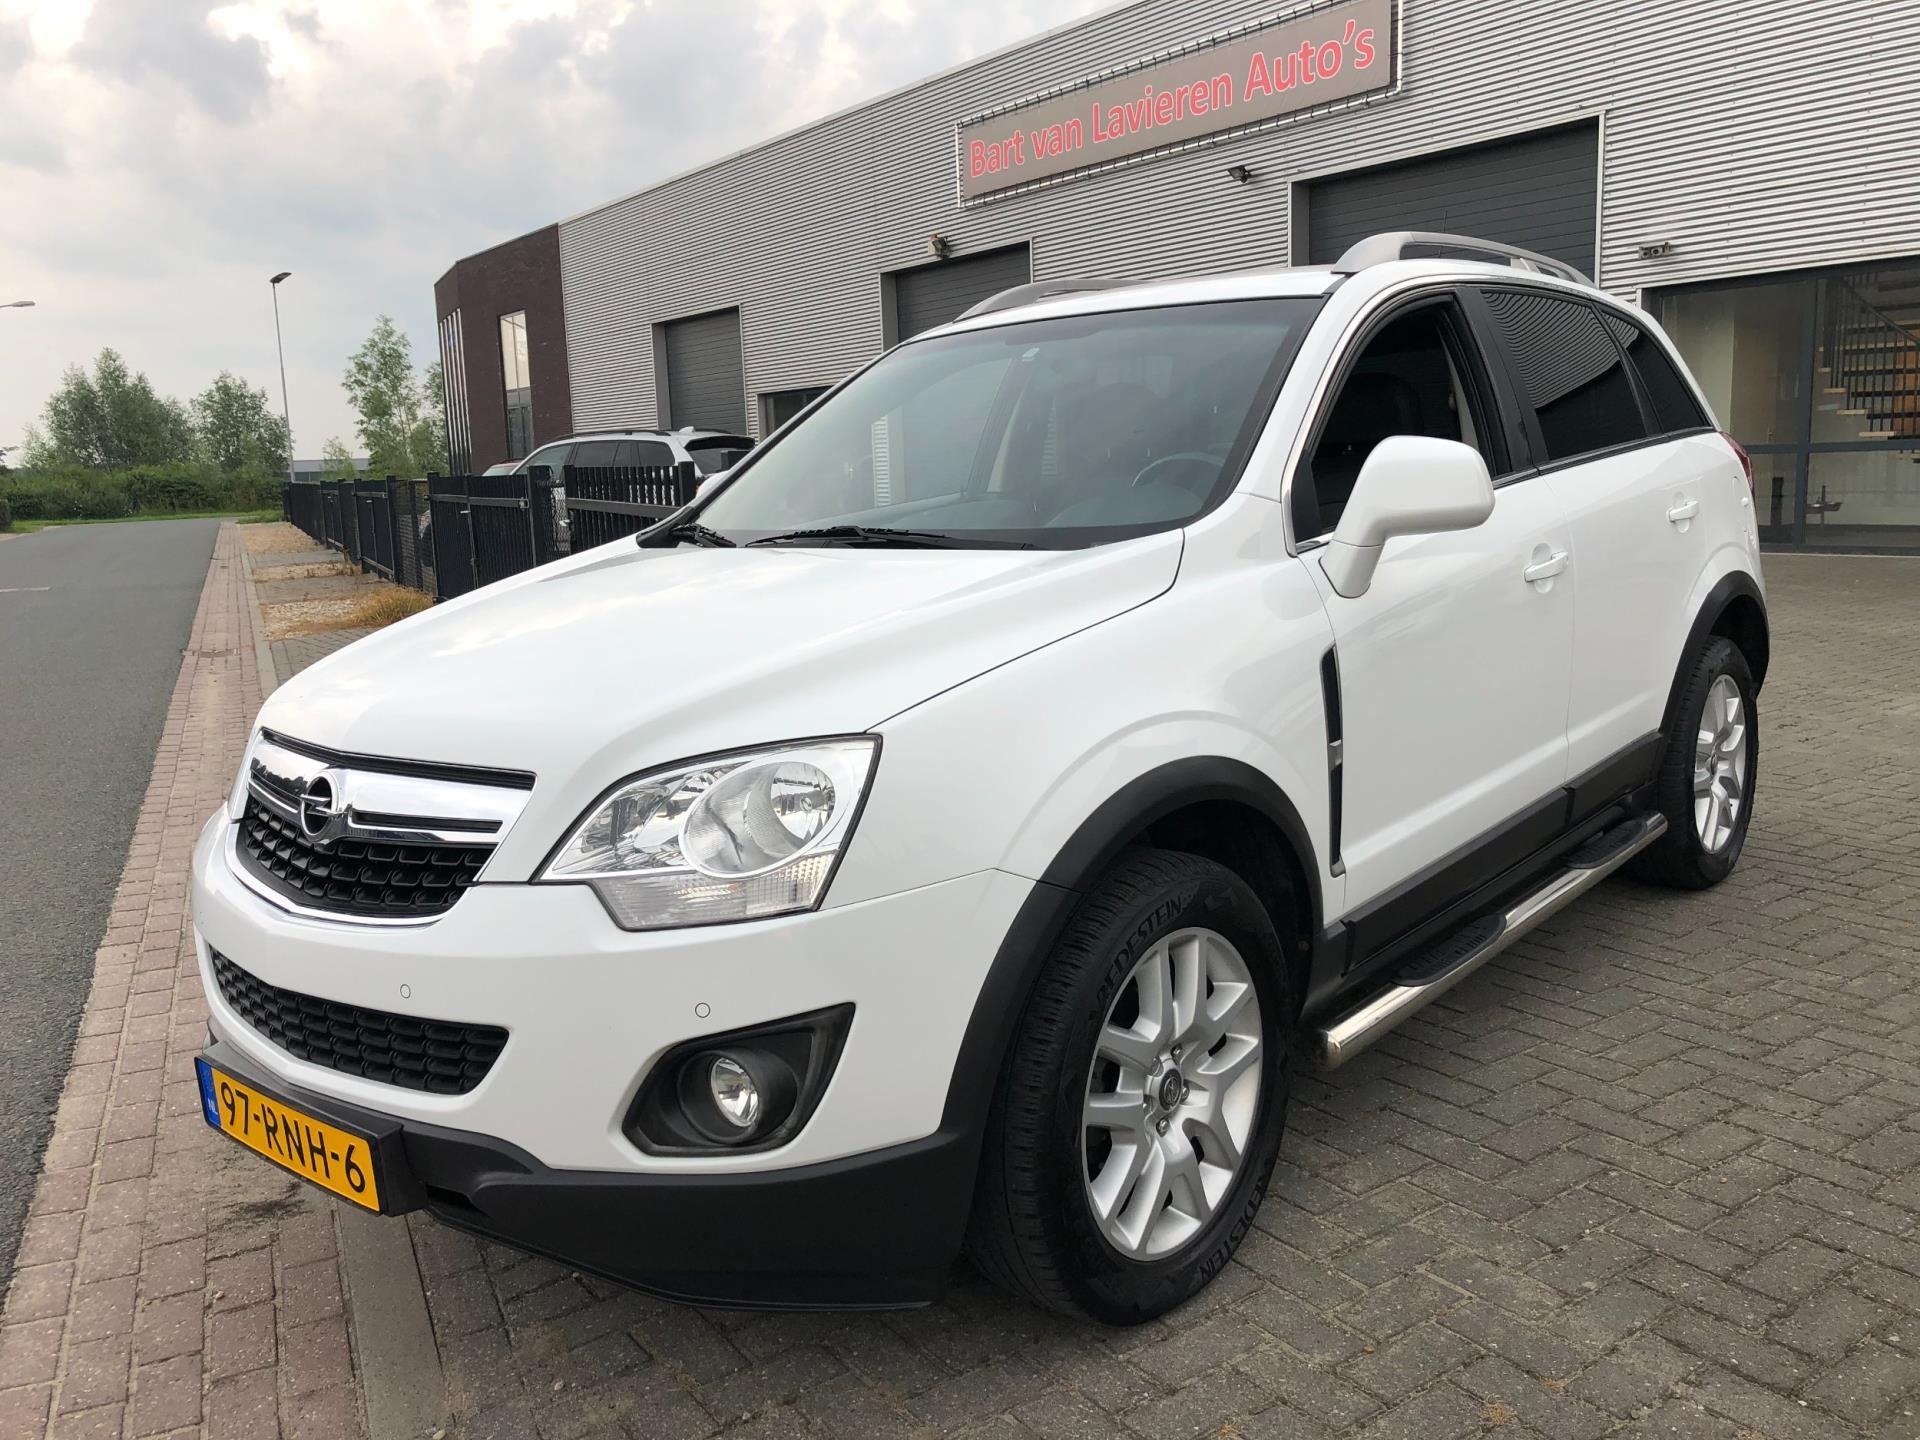 Opel Antara occasion - Bart van Lavieren Auto's